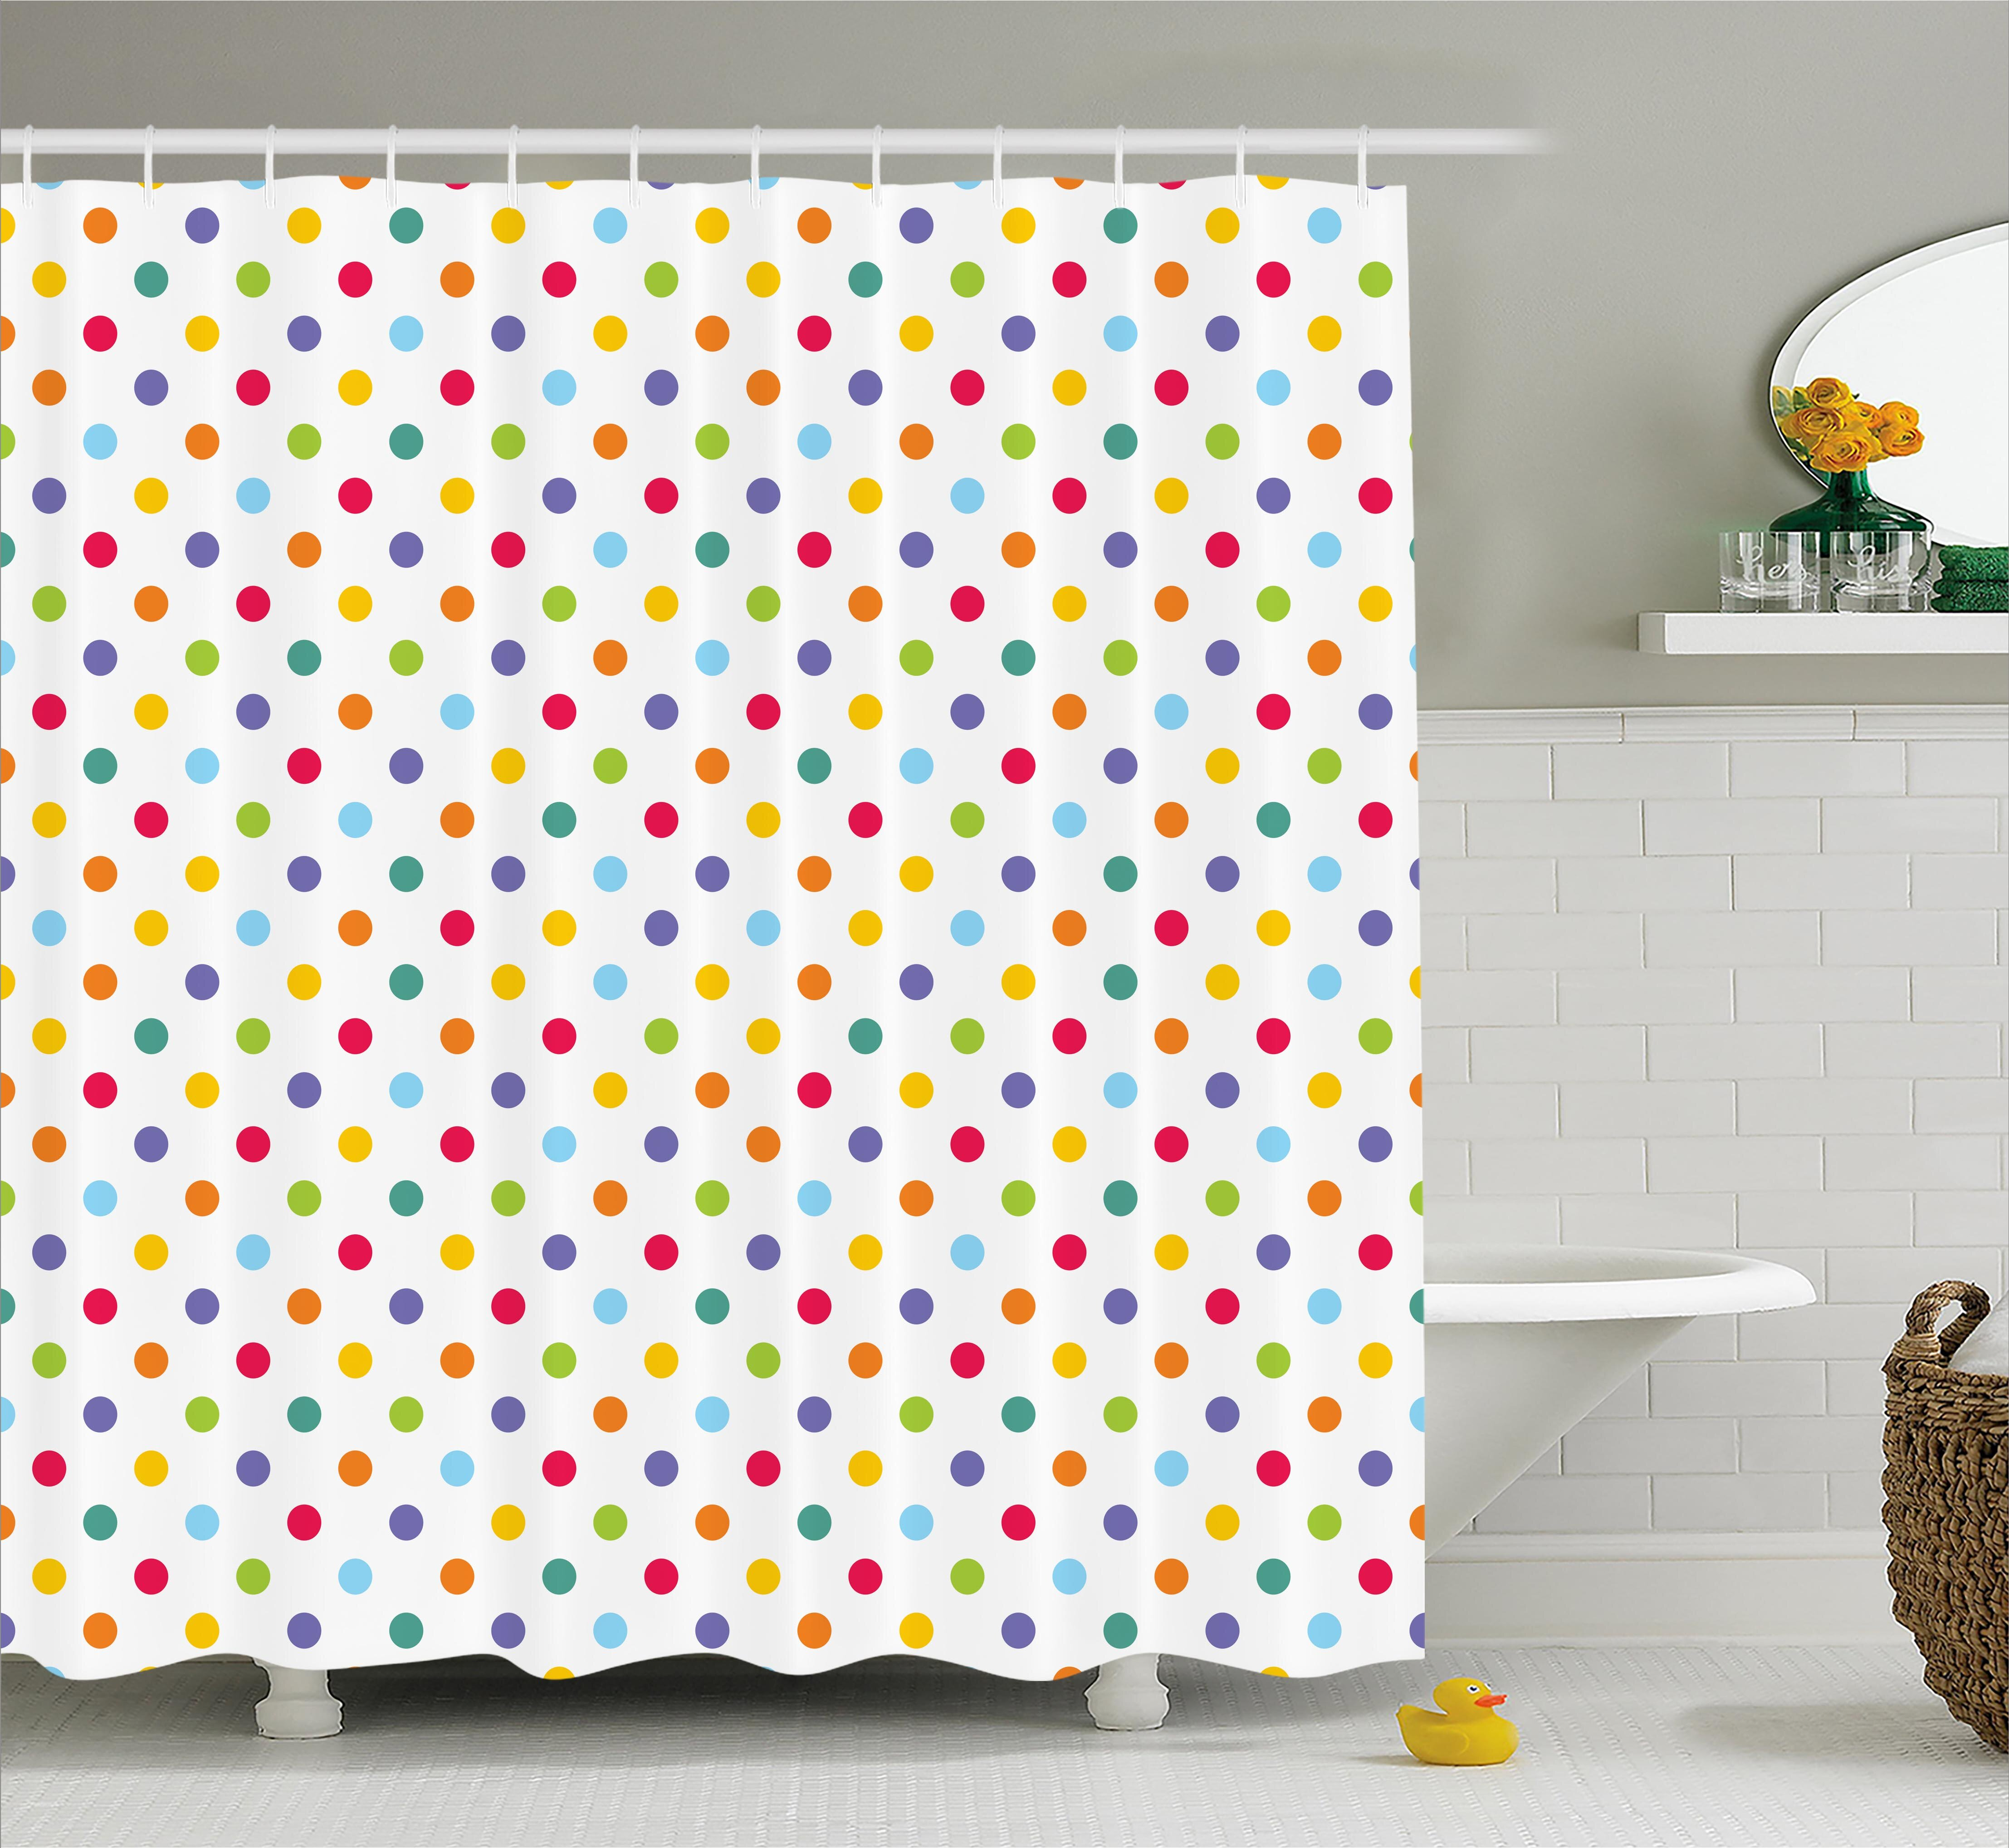 Viv Rae Bradford Colorful Polka Dots Shower Curtain